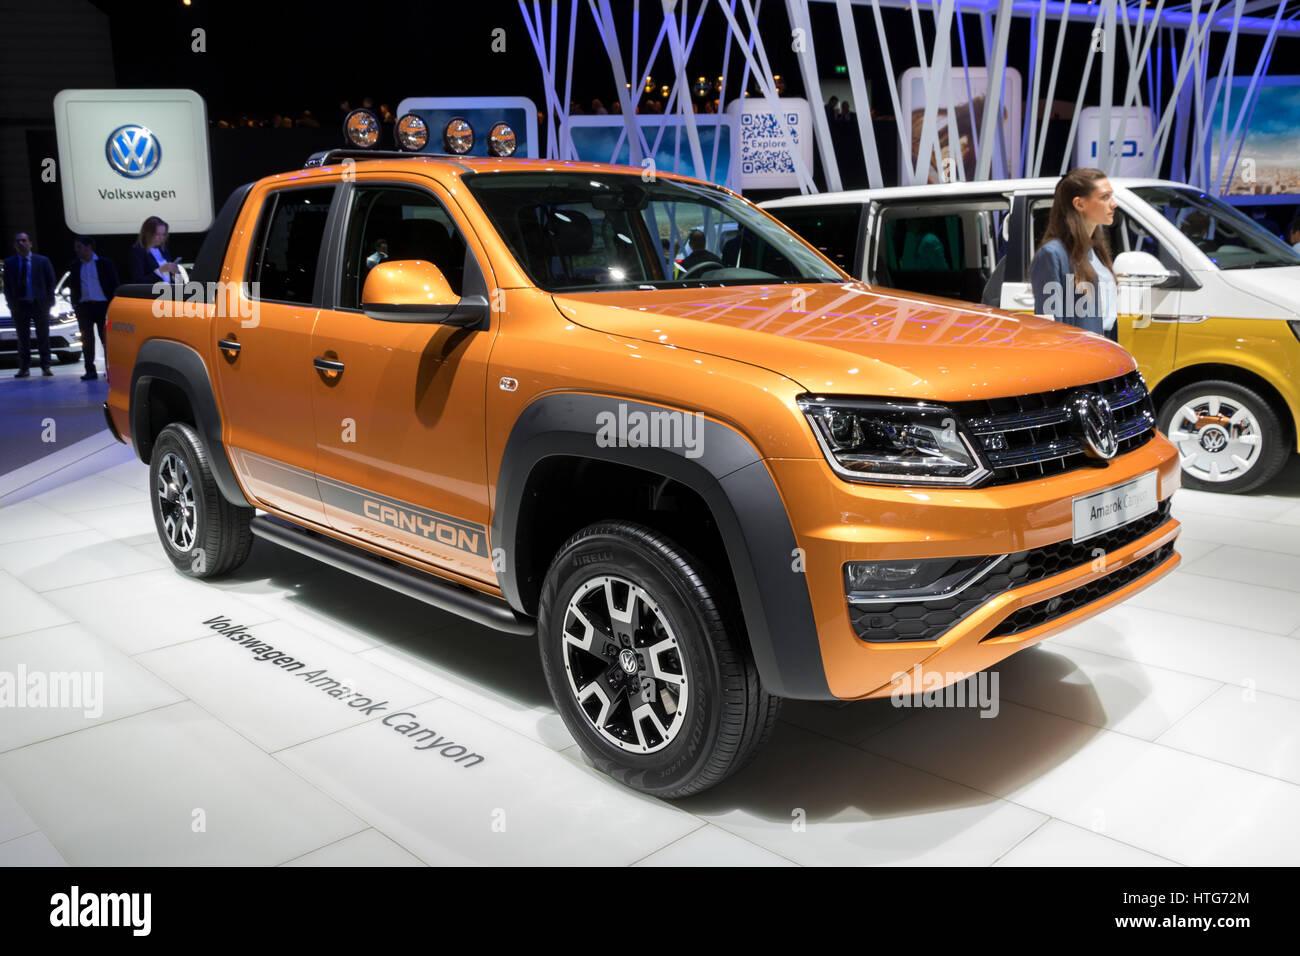 GENEVA, SWITZERLAND - MARCH 7, 2017: Volkswagen Amarok